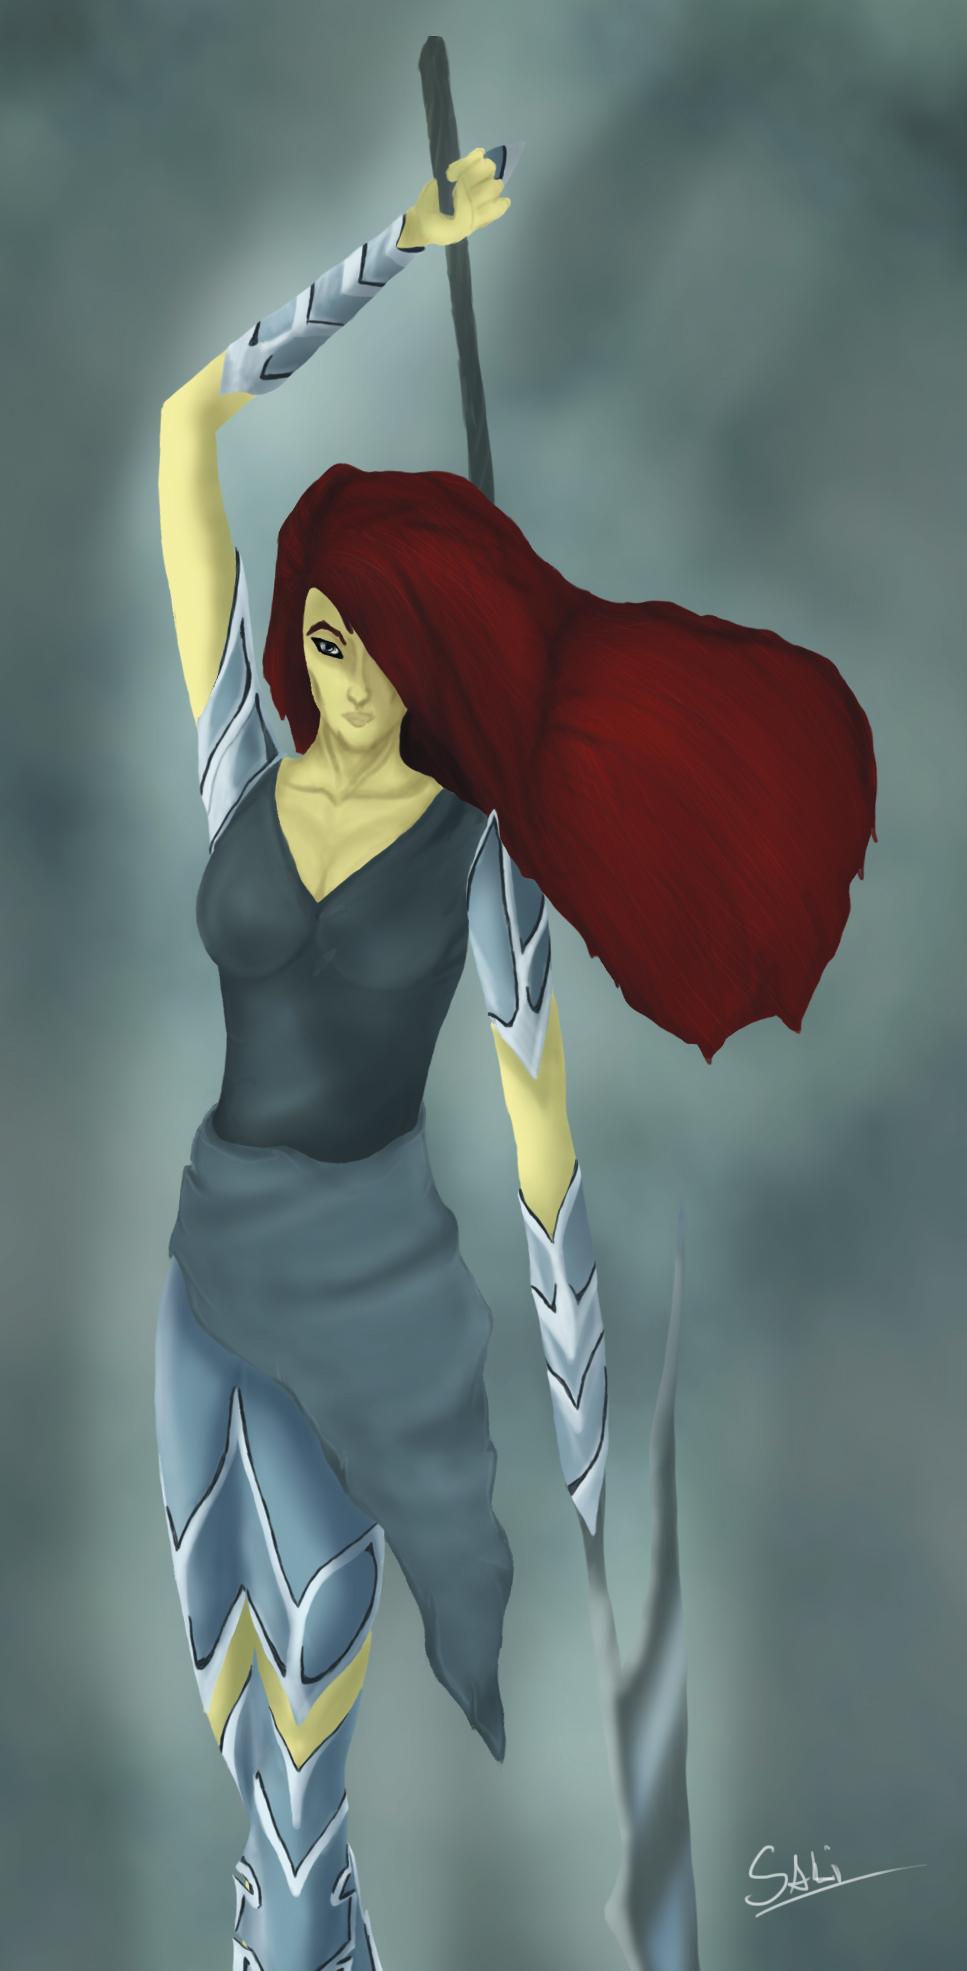 Queen of Grayness